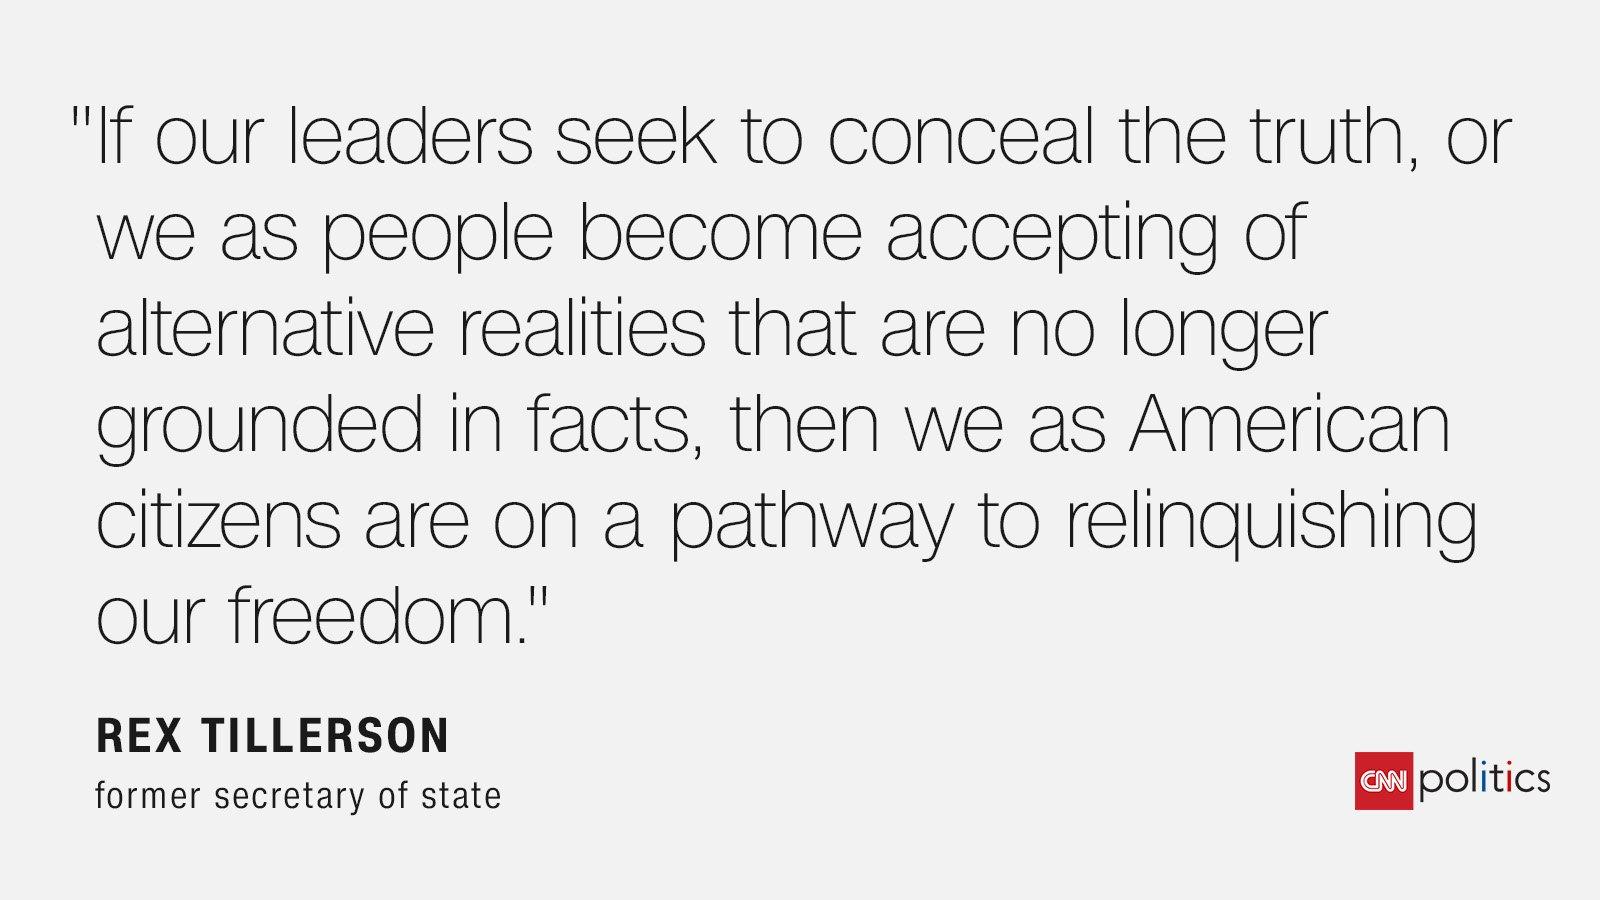 Rex Tillerson just majorly trolled Donald Trump | Analysis by CNN's Chris Cillizza https://t.co/2QmdkFGQNR https://t.co/s35HW4Dkcy